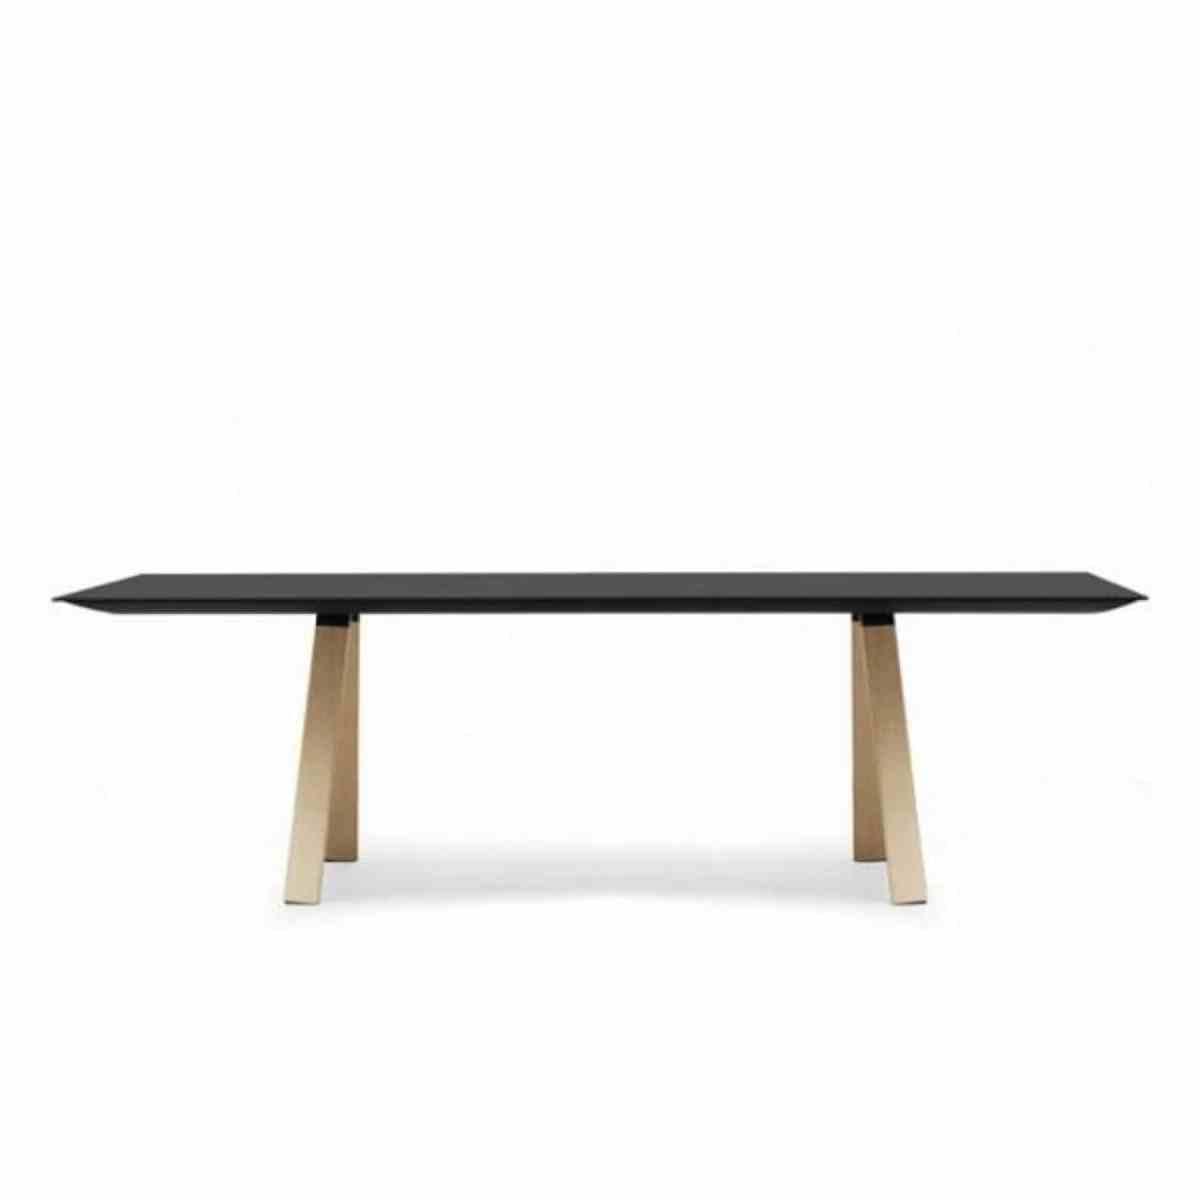 Arki design tafel wood de jong kantoormeubilair for Table structure design